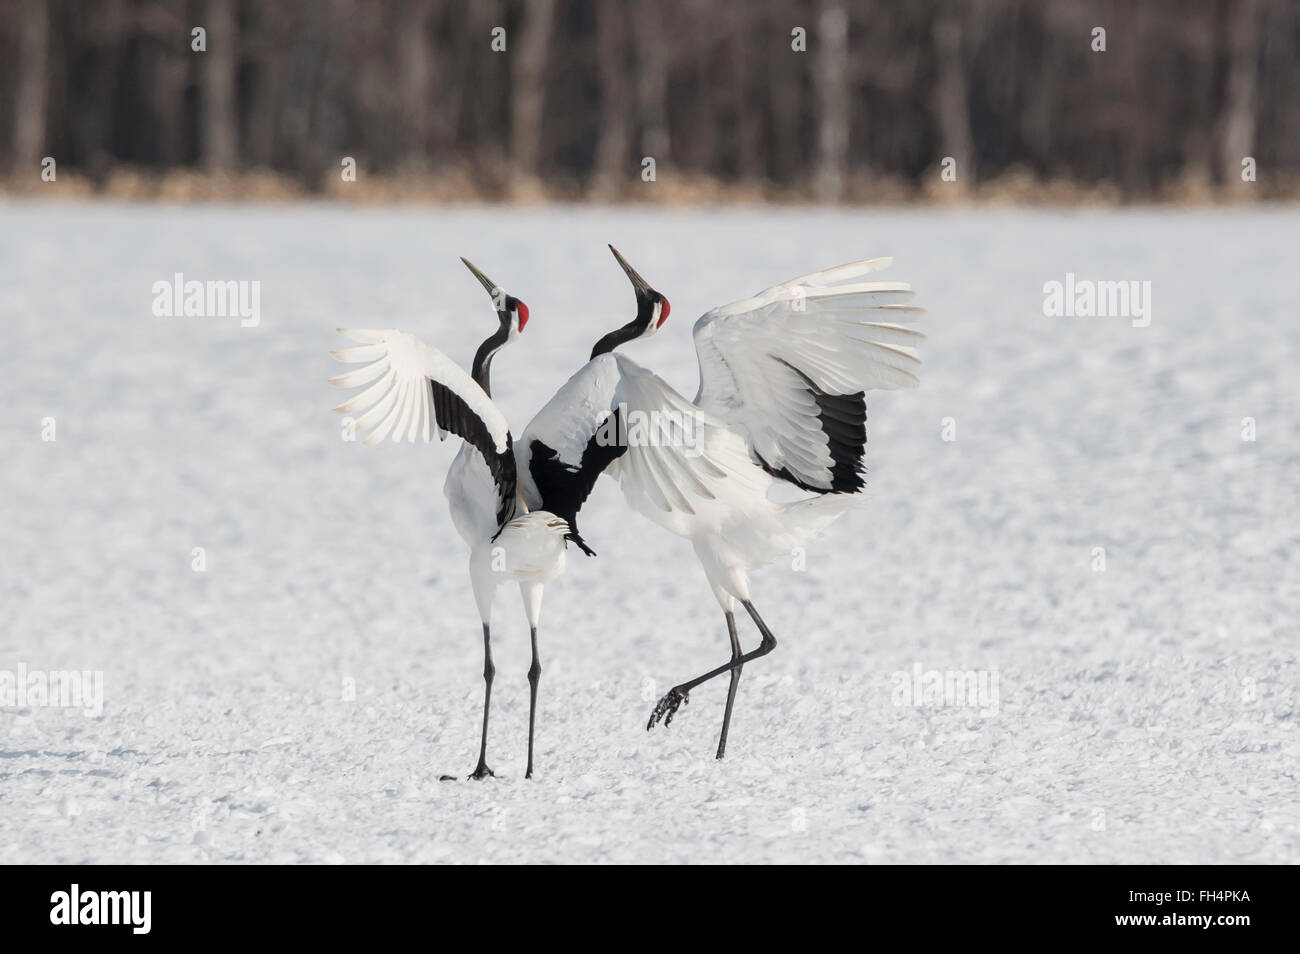 Red-crowed crane, Japanese crane, Grus japonensis, breeding display, Hokkaido, Japan - Stock Image